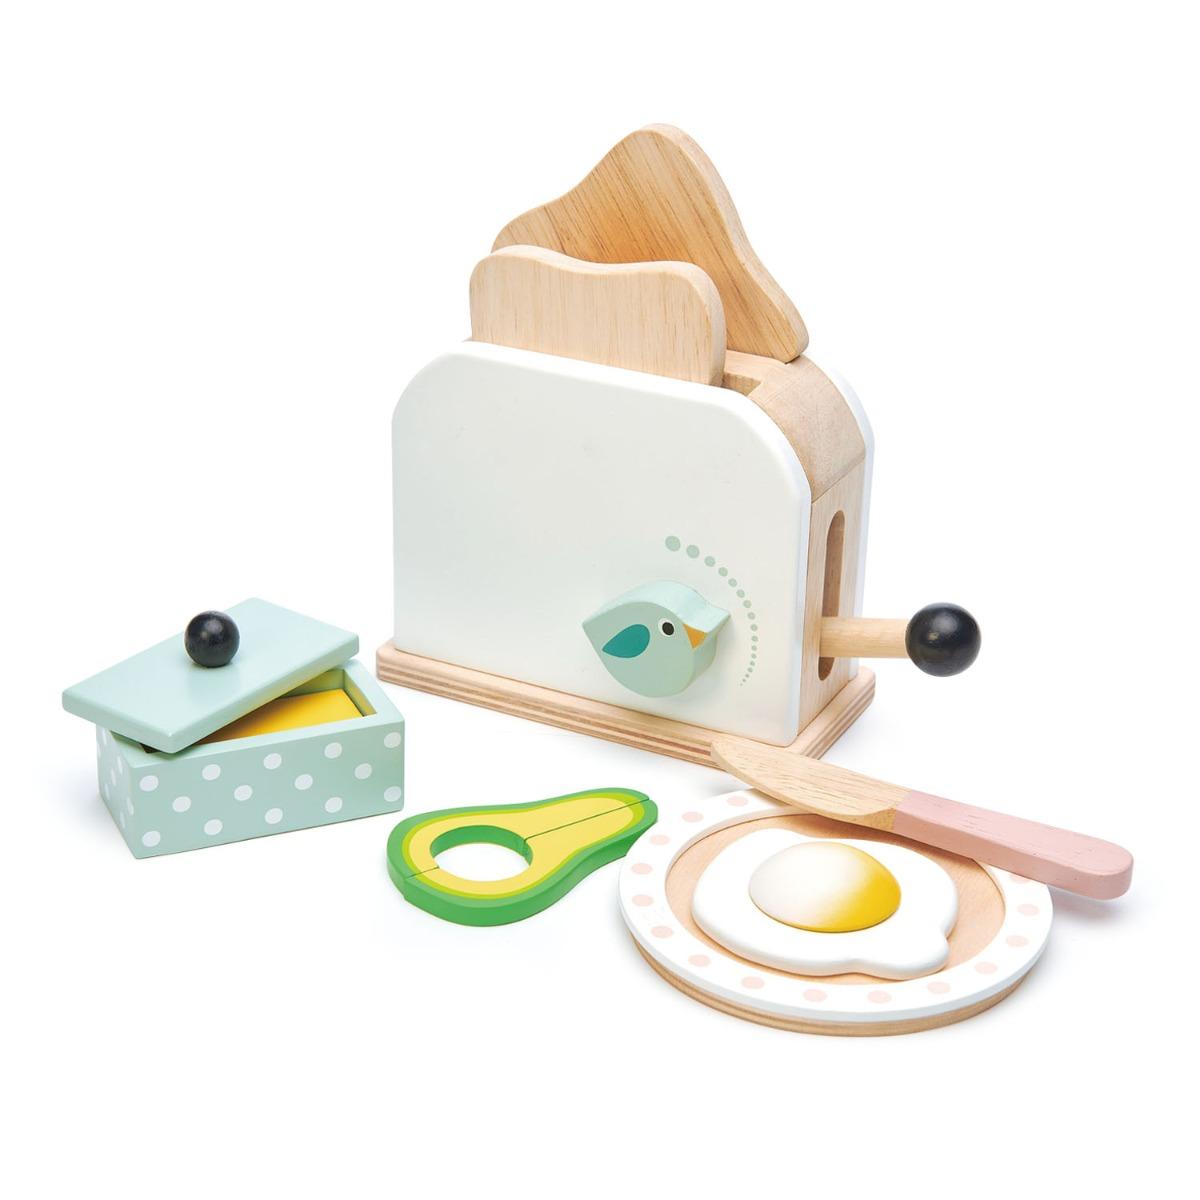 Set de joaca, Prajitor de paine din lemn, Breakfast toaster, Tender Leaf Toys, 10 piese imagine